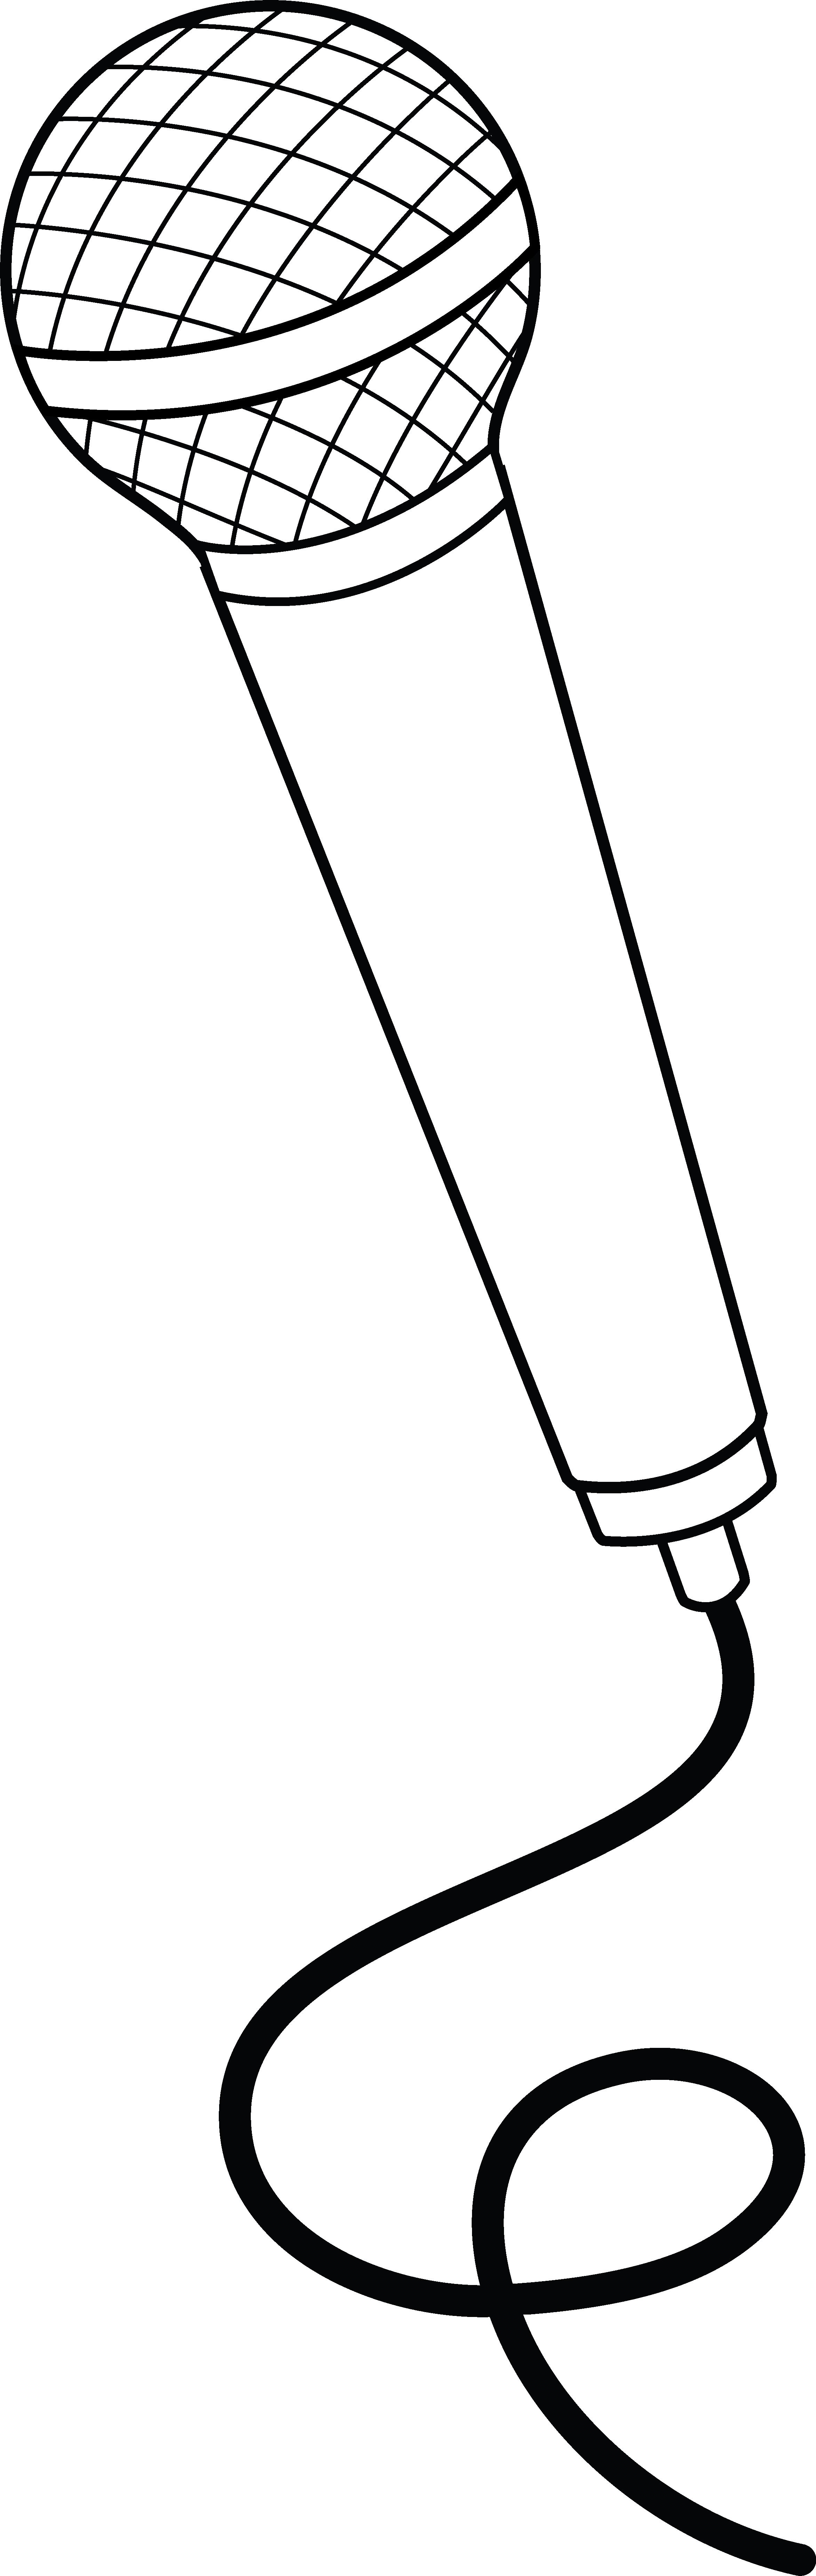 mikrofon malvorlage   Coloring and Malvorlagan